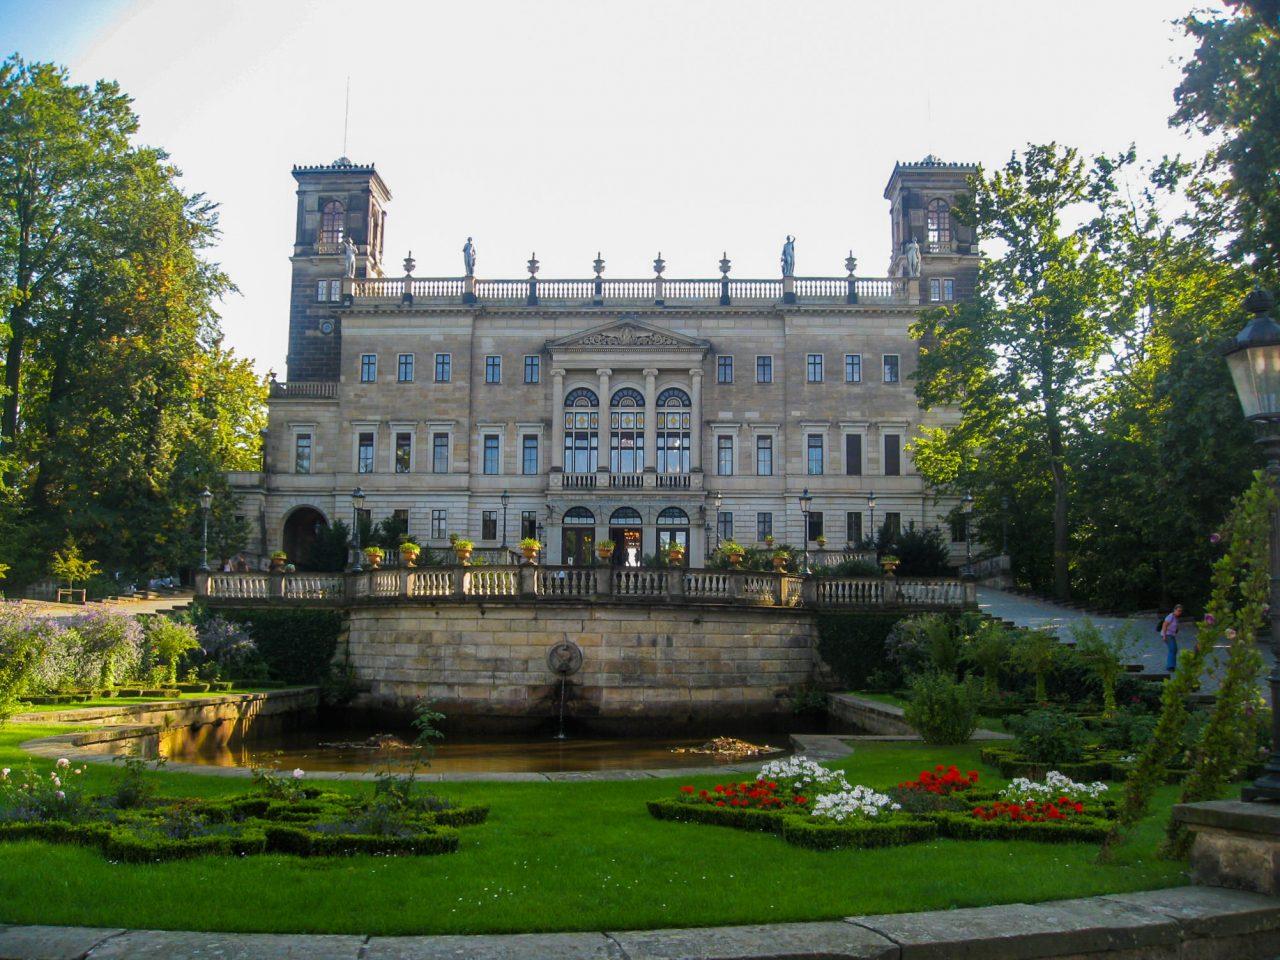 Замок Альбрехтсберг (Schloss Albrechtsberg)